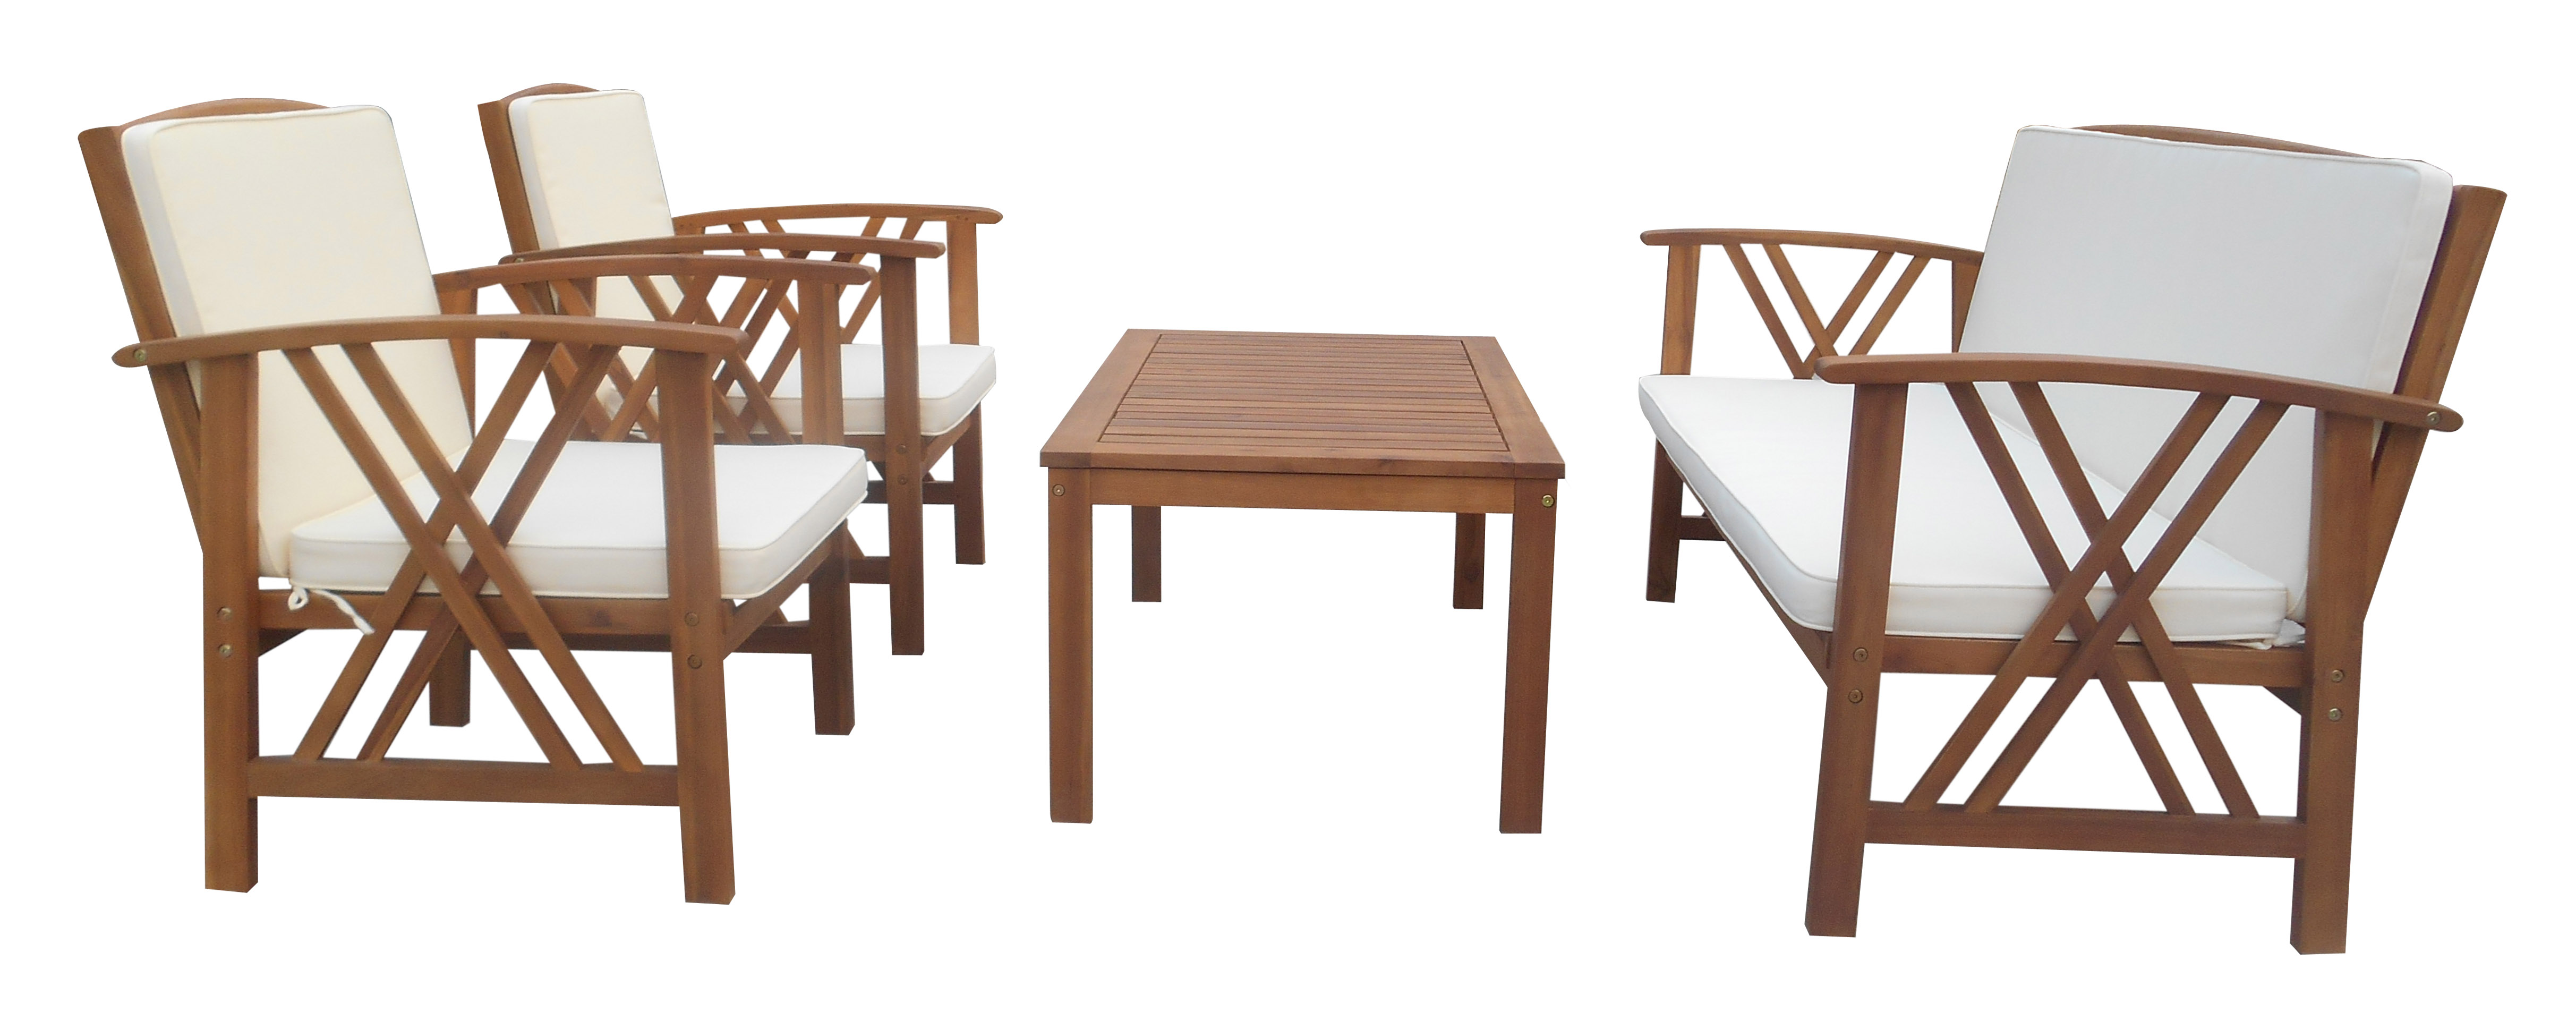 sofa set-ht01